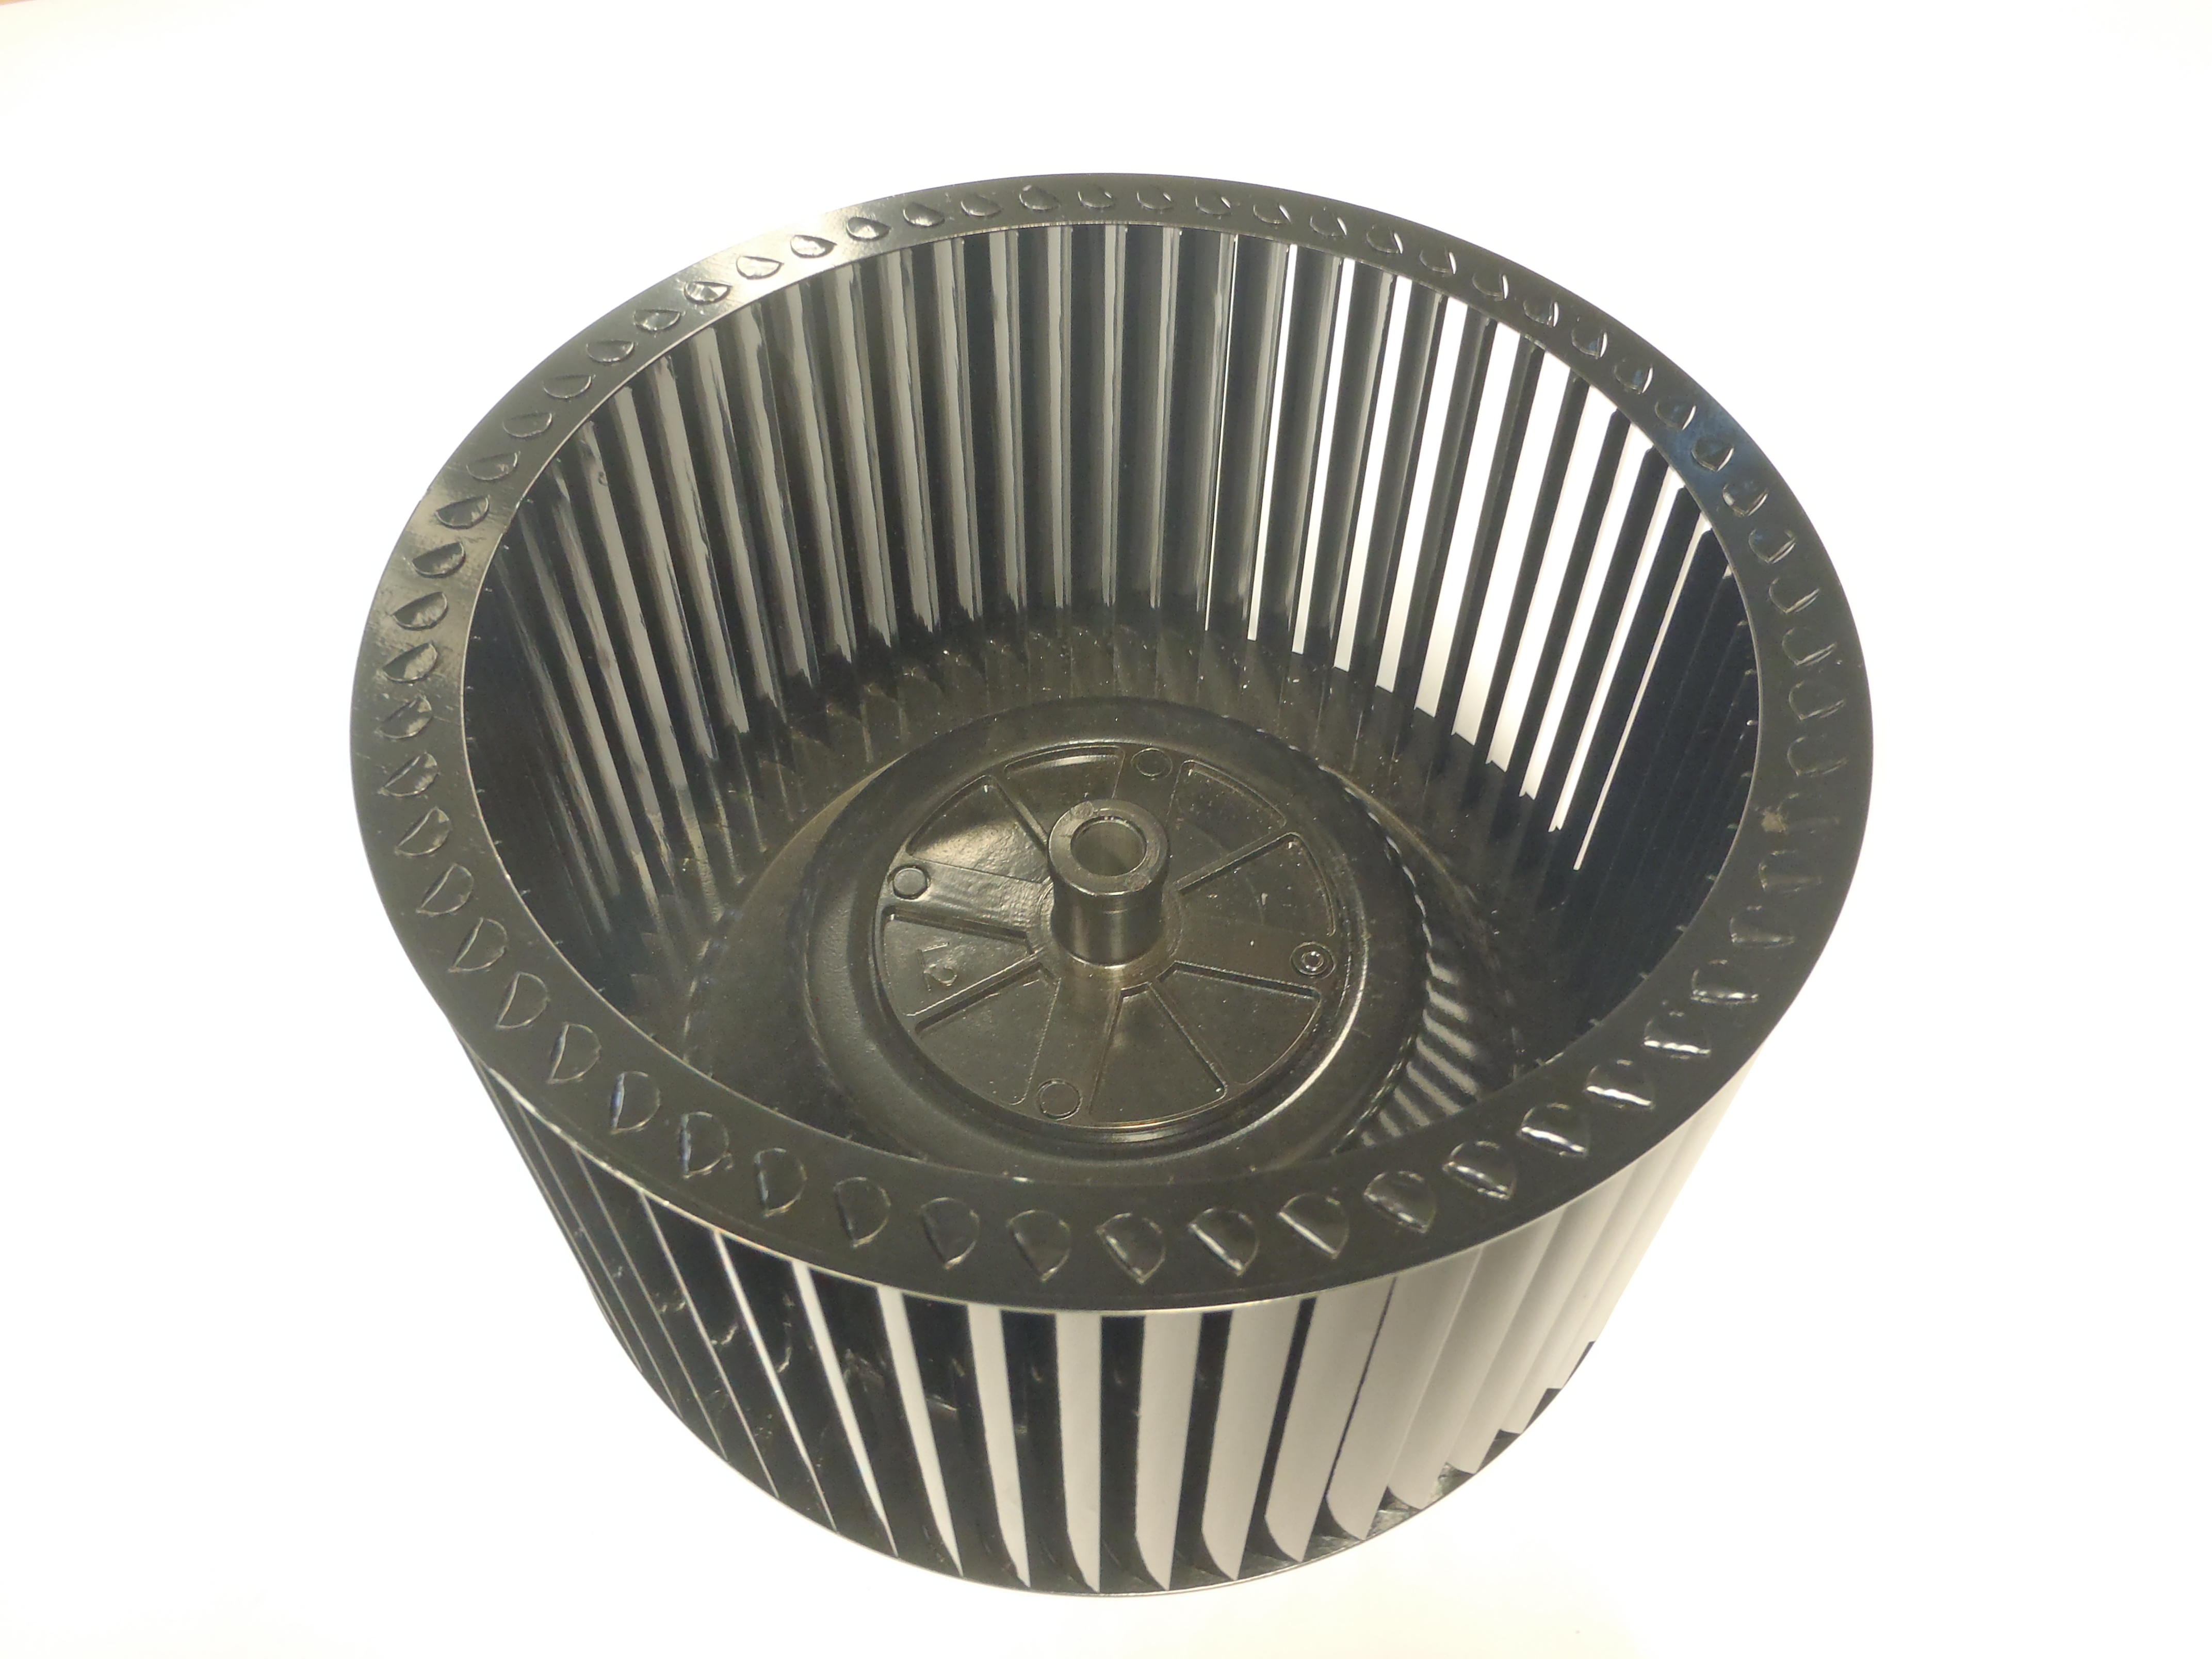 New Rotor Motor Fan Ventilation Exporter For 1500mm Range